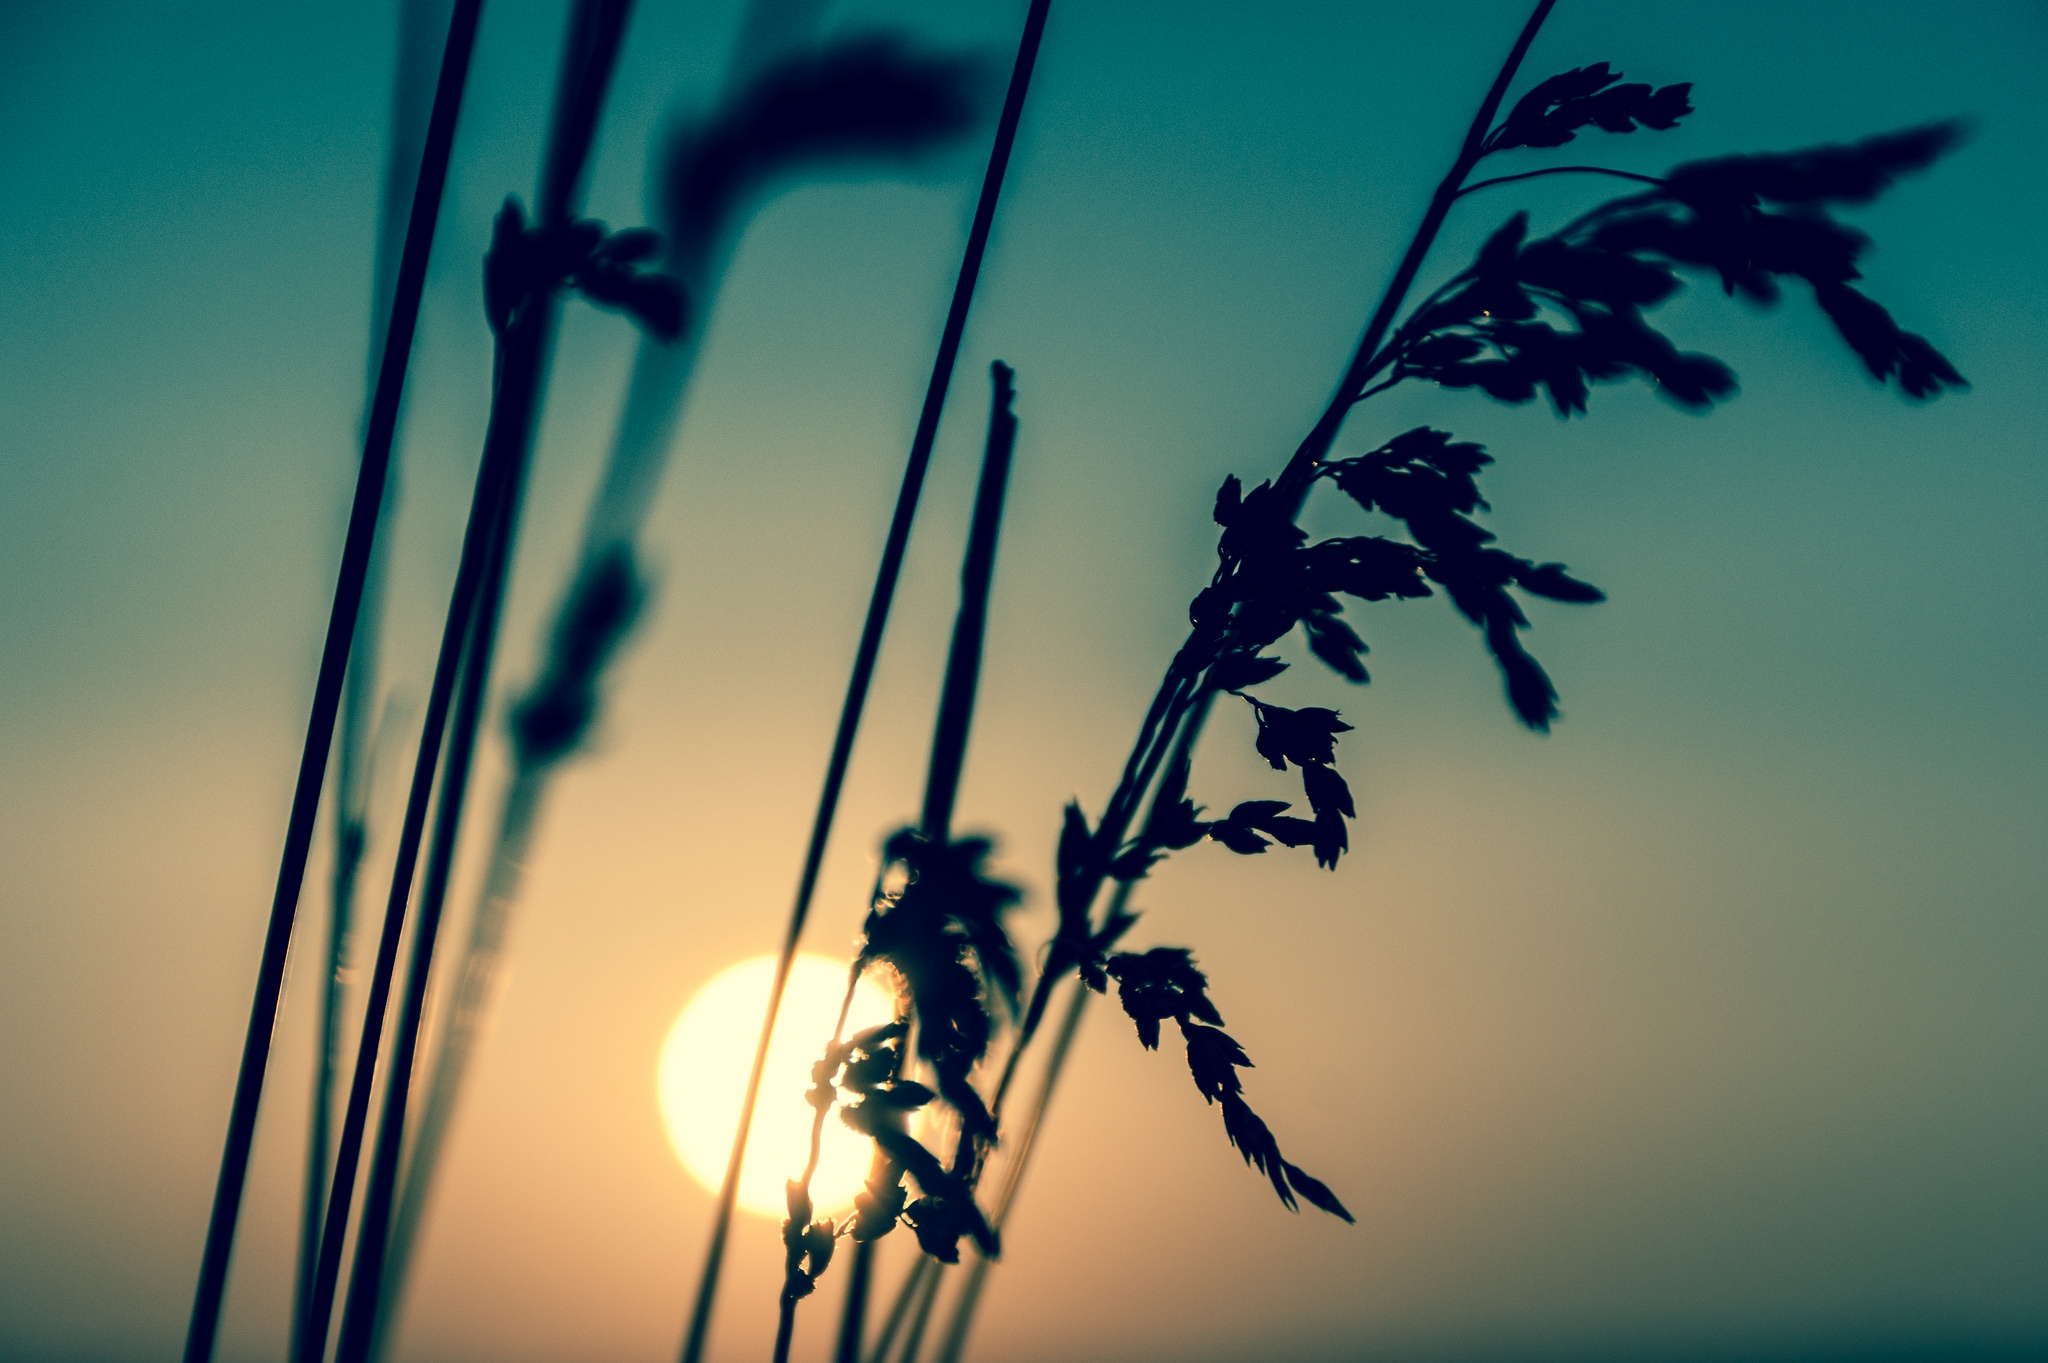 Gorgeous Vintage Sunset Background